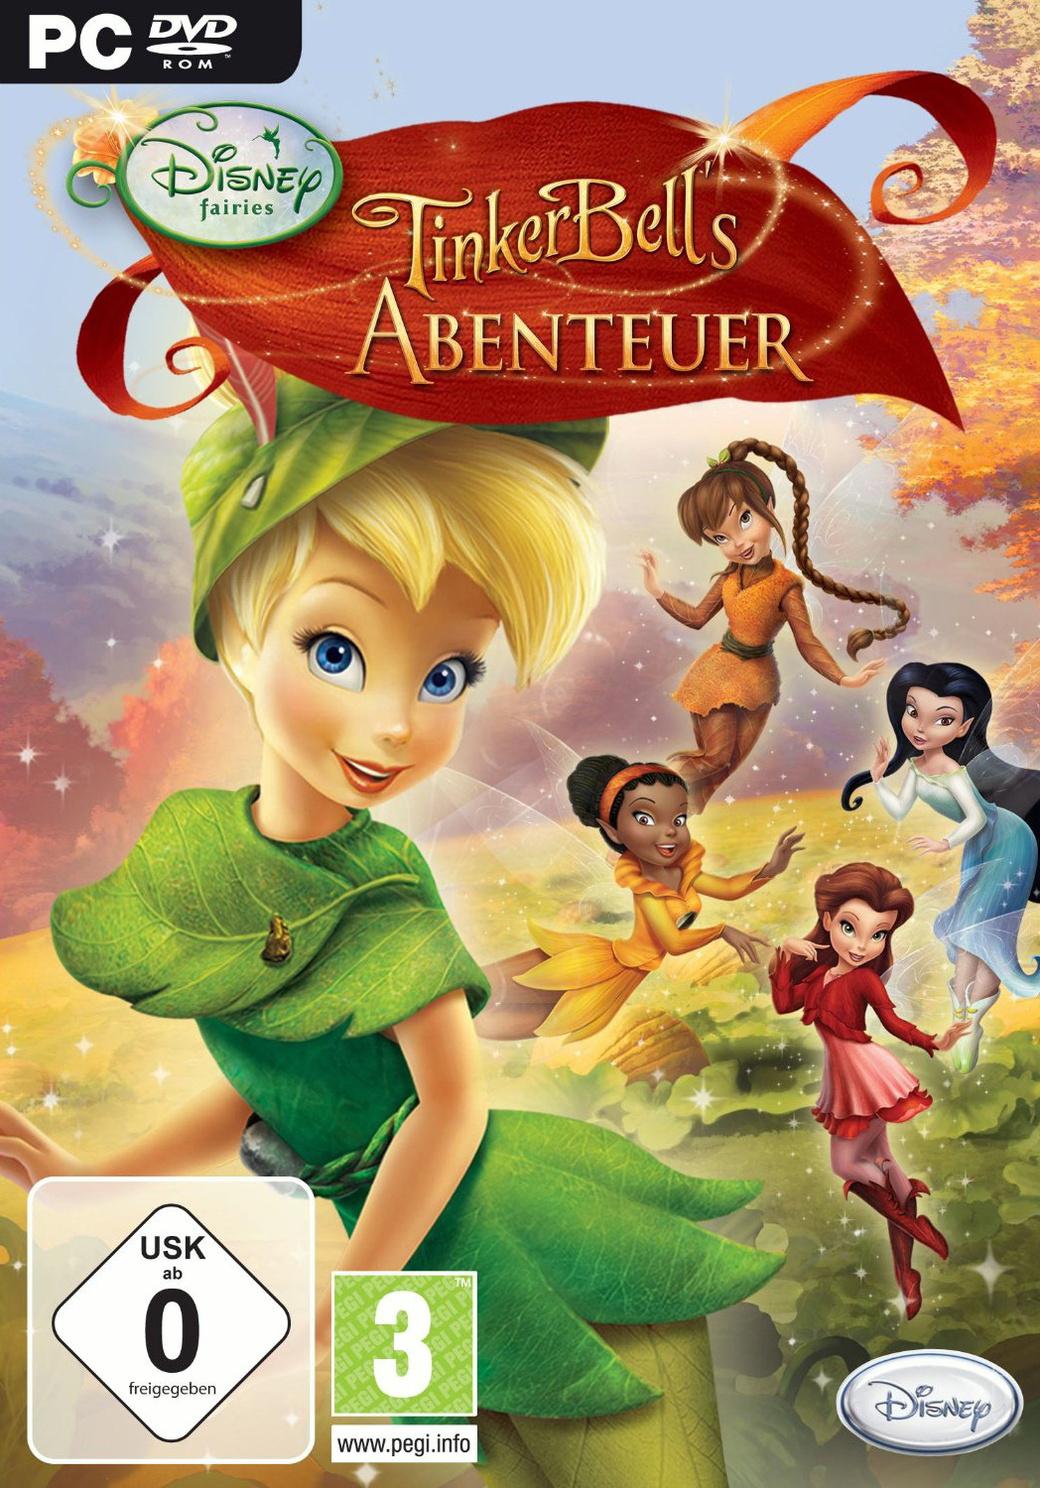 Fairies Disney Preisvergleich